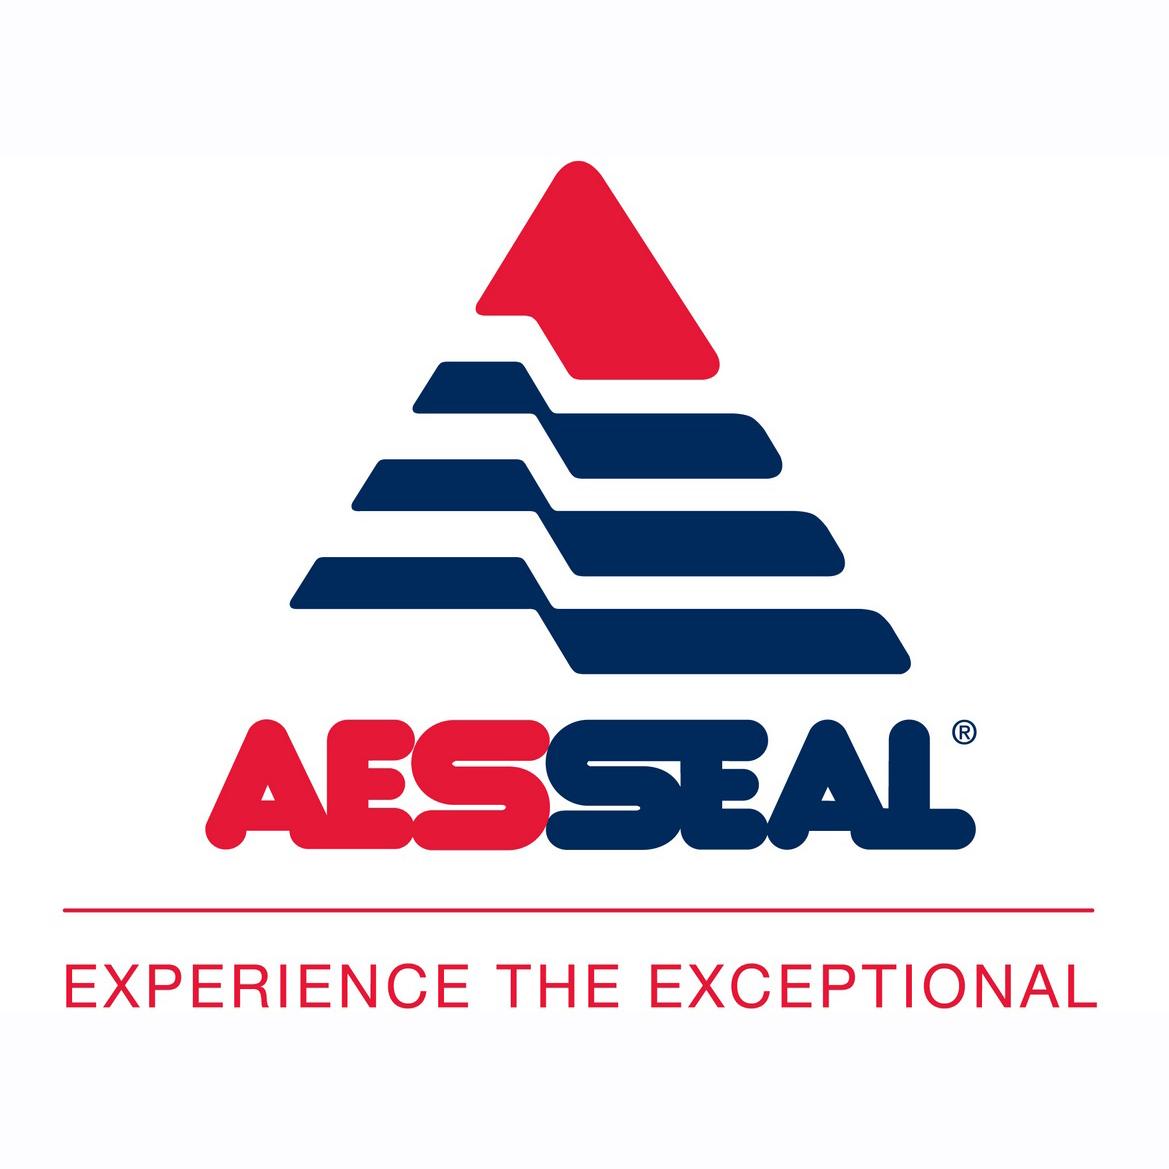 AESSEAL logo